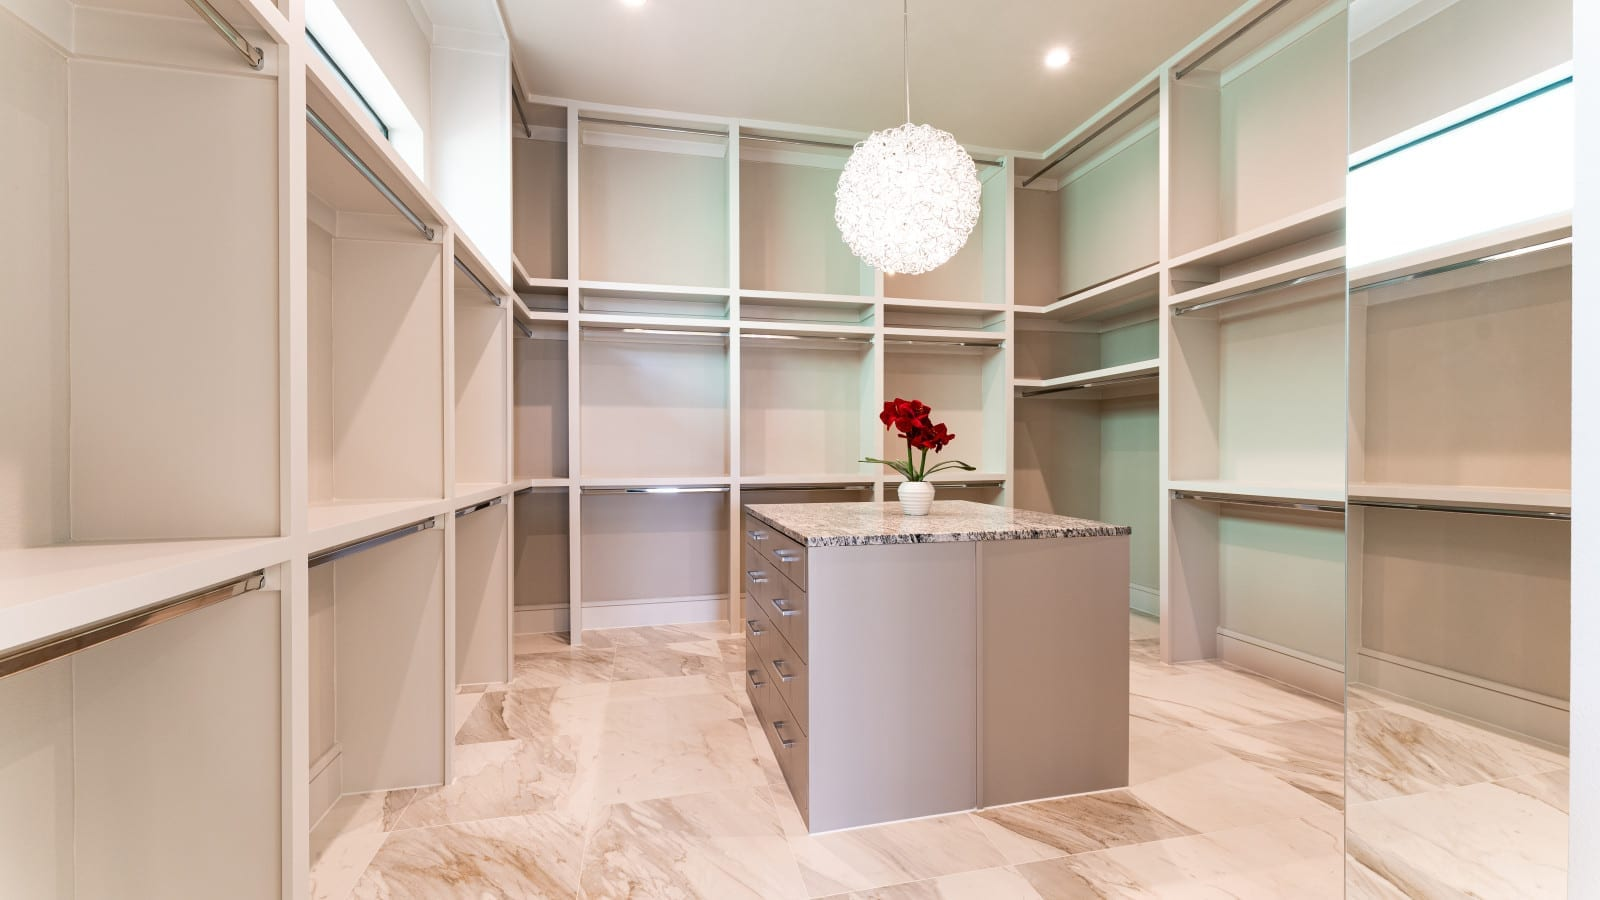 Modern Style Homes design # 22 - Millennial Design + Build